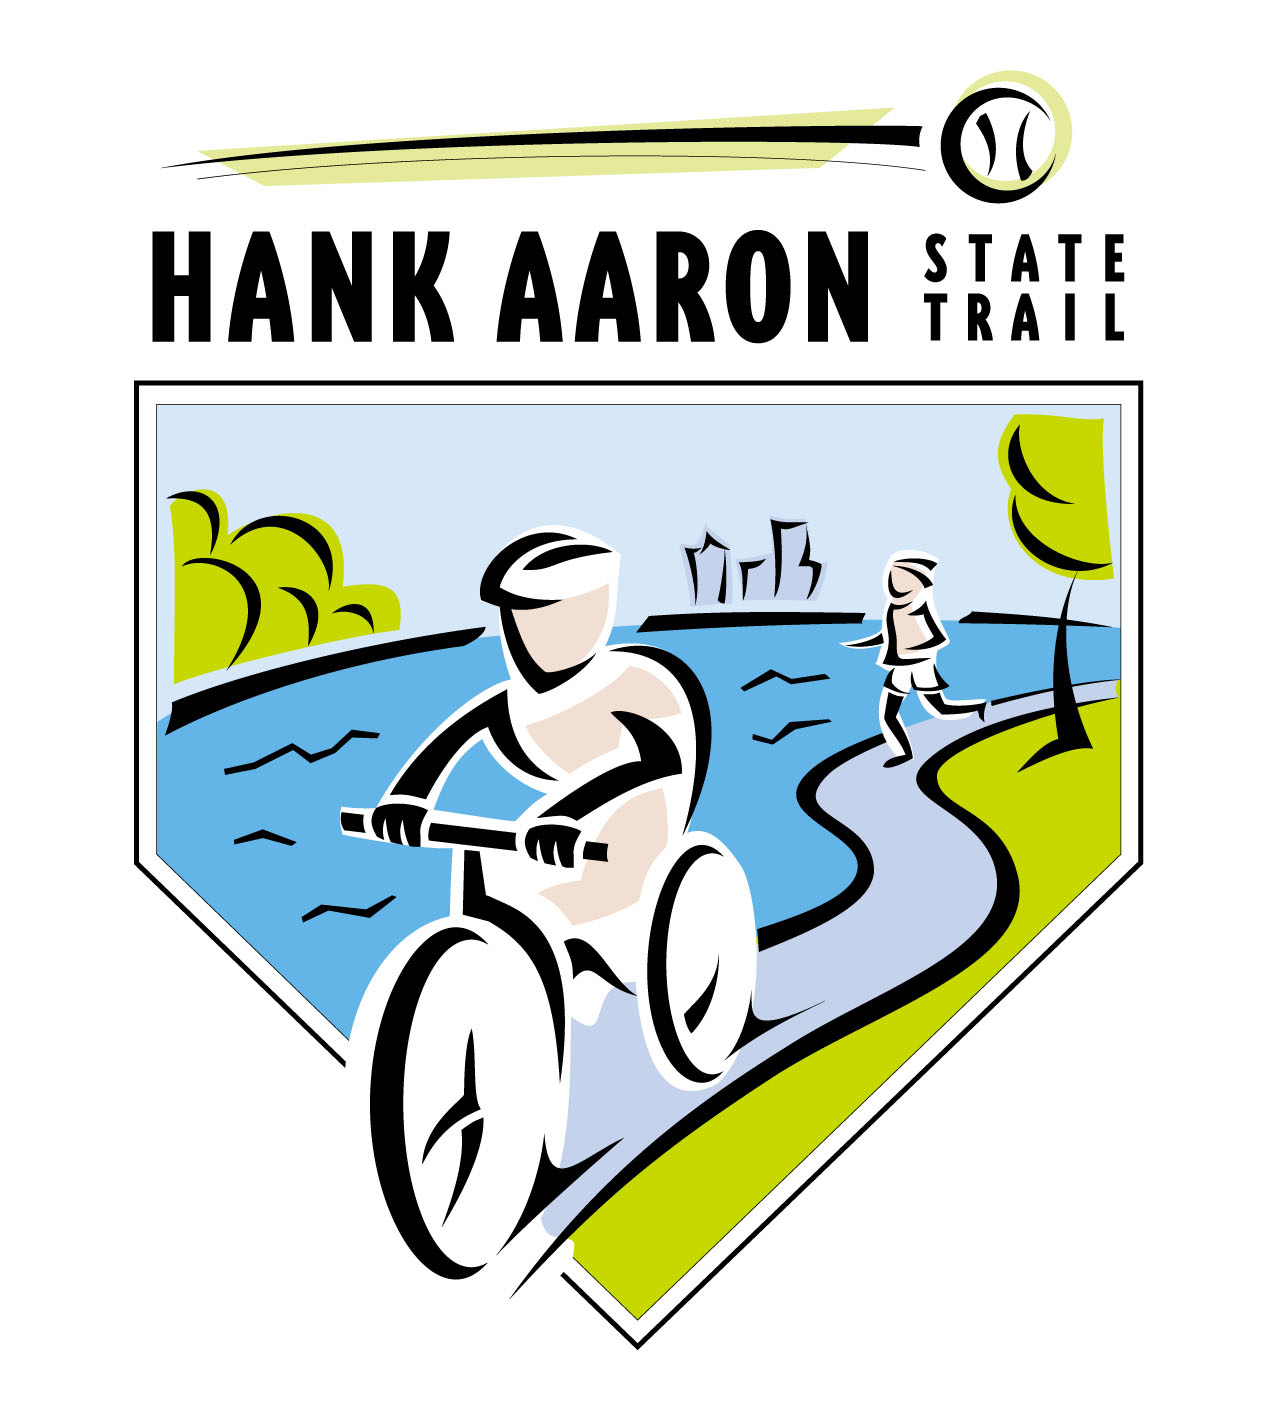 Hank Aaron State Trail